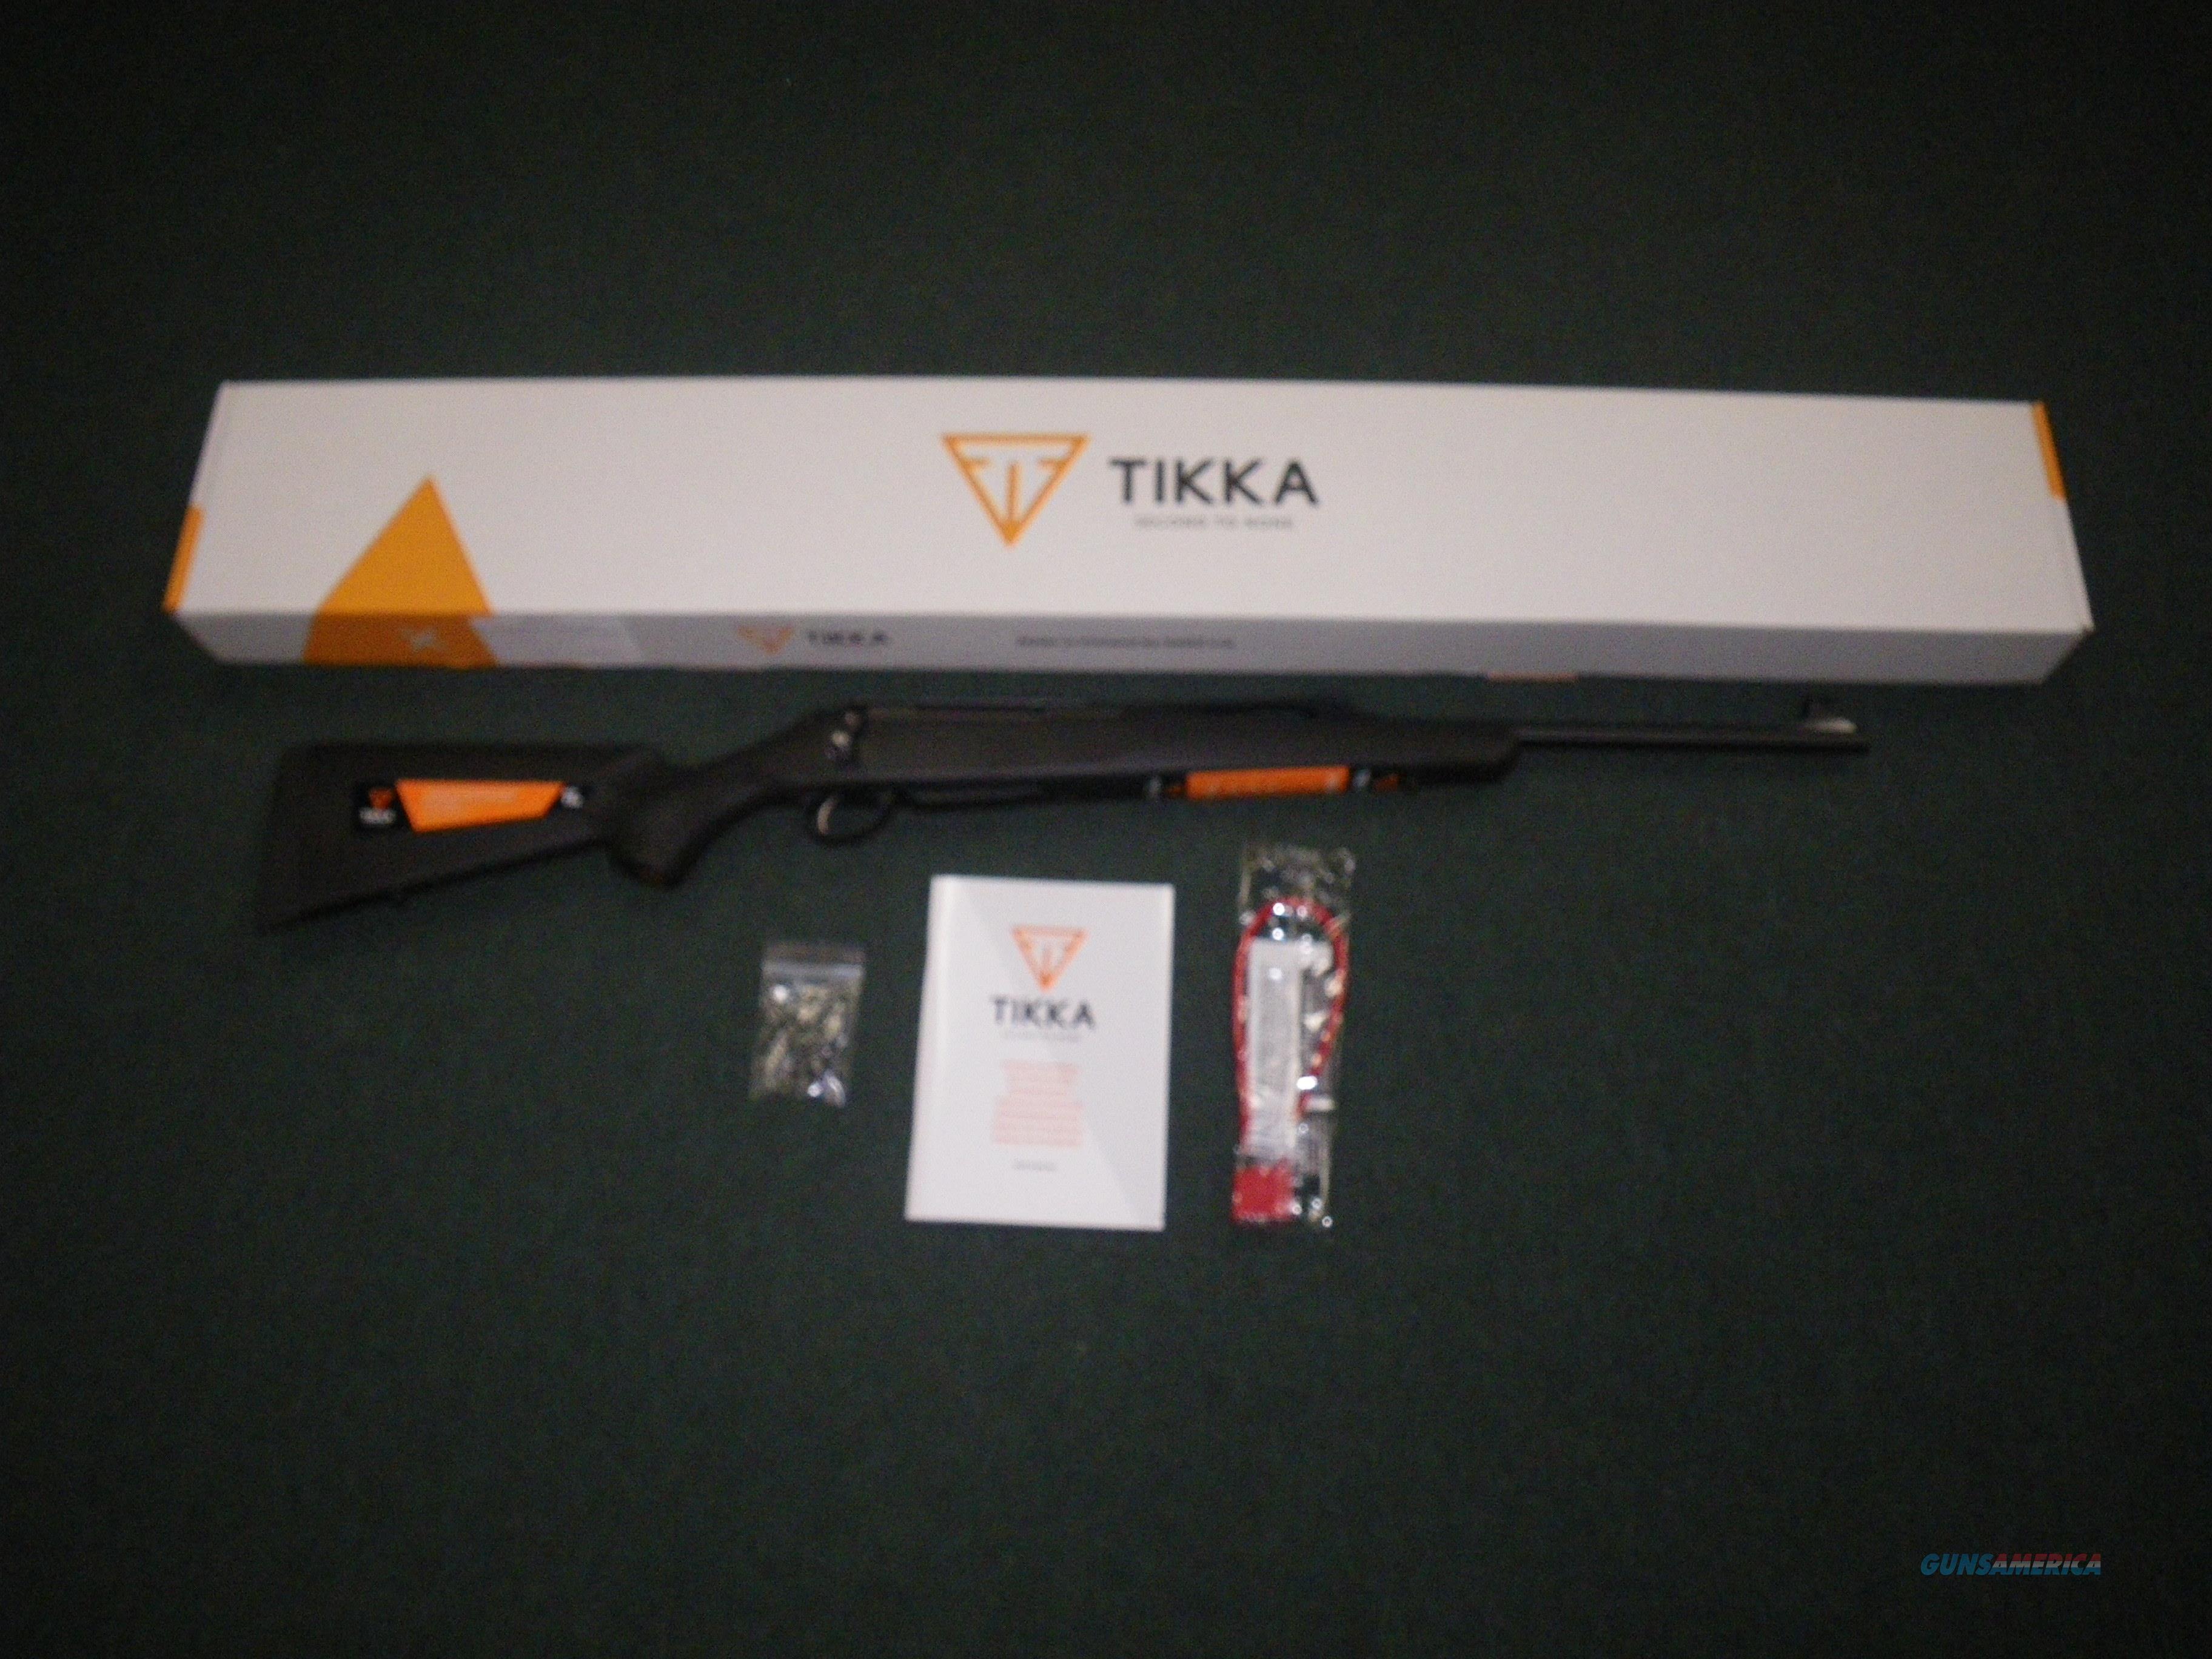 "Tikka T3x Battue Lite 30-06 Spfld 20"" NEW JRTXB620  Guns > Rifles > Tikka Rifles > T3"